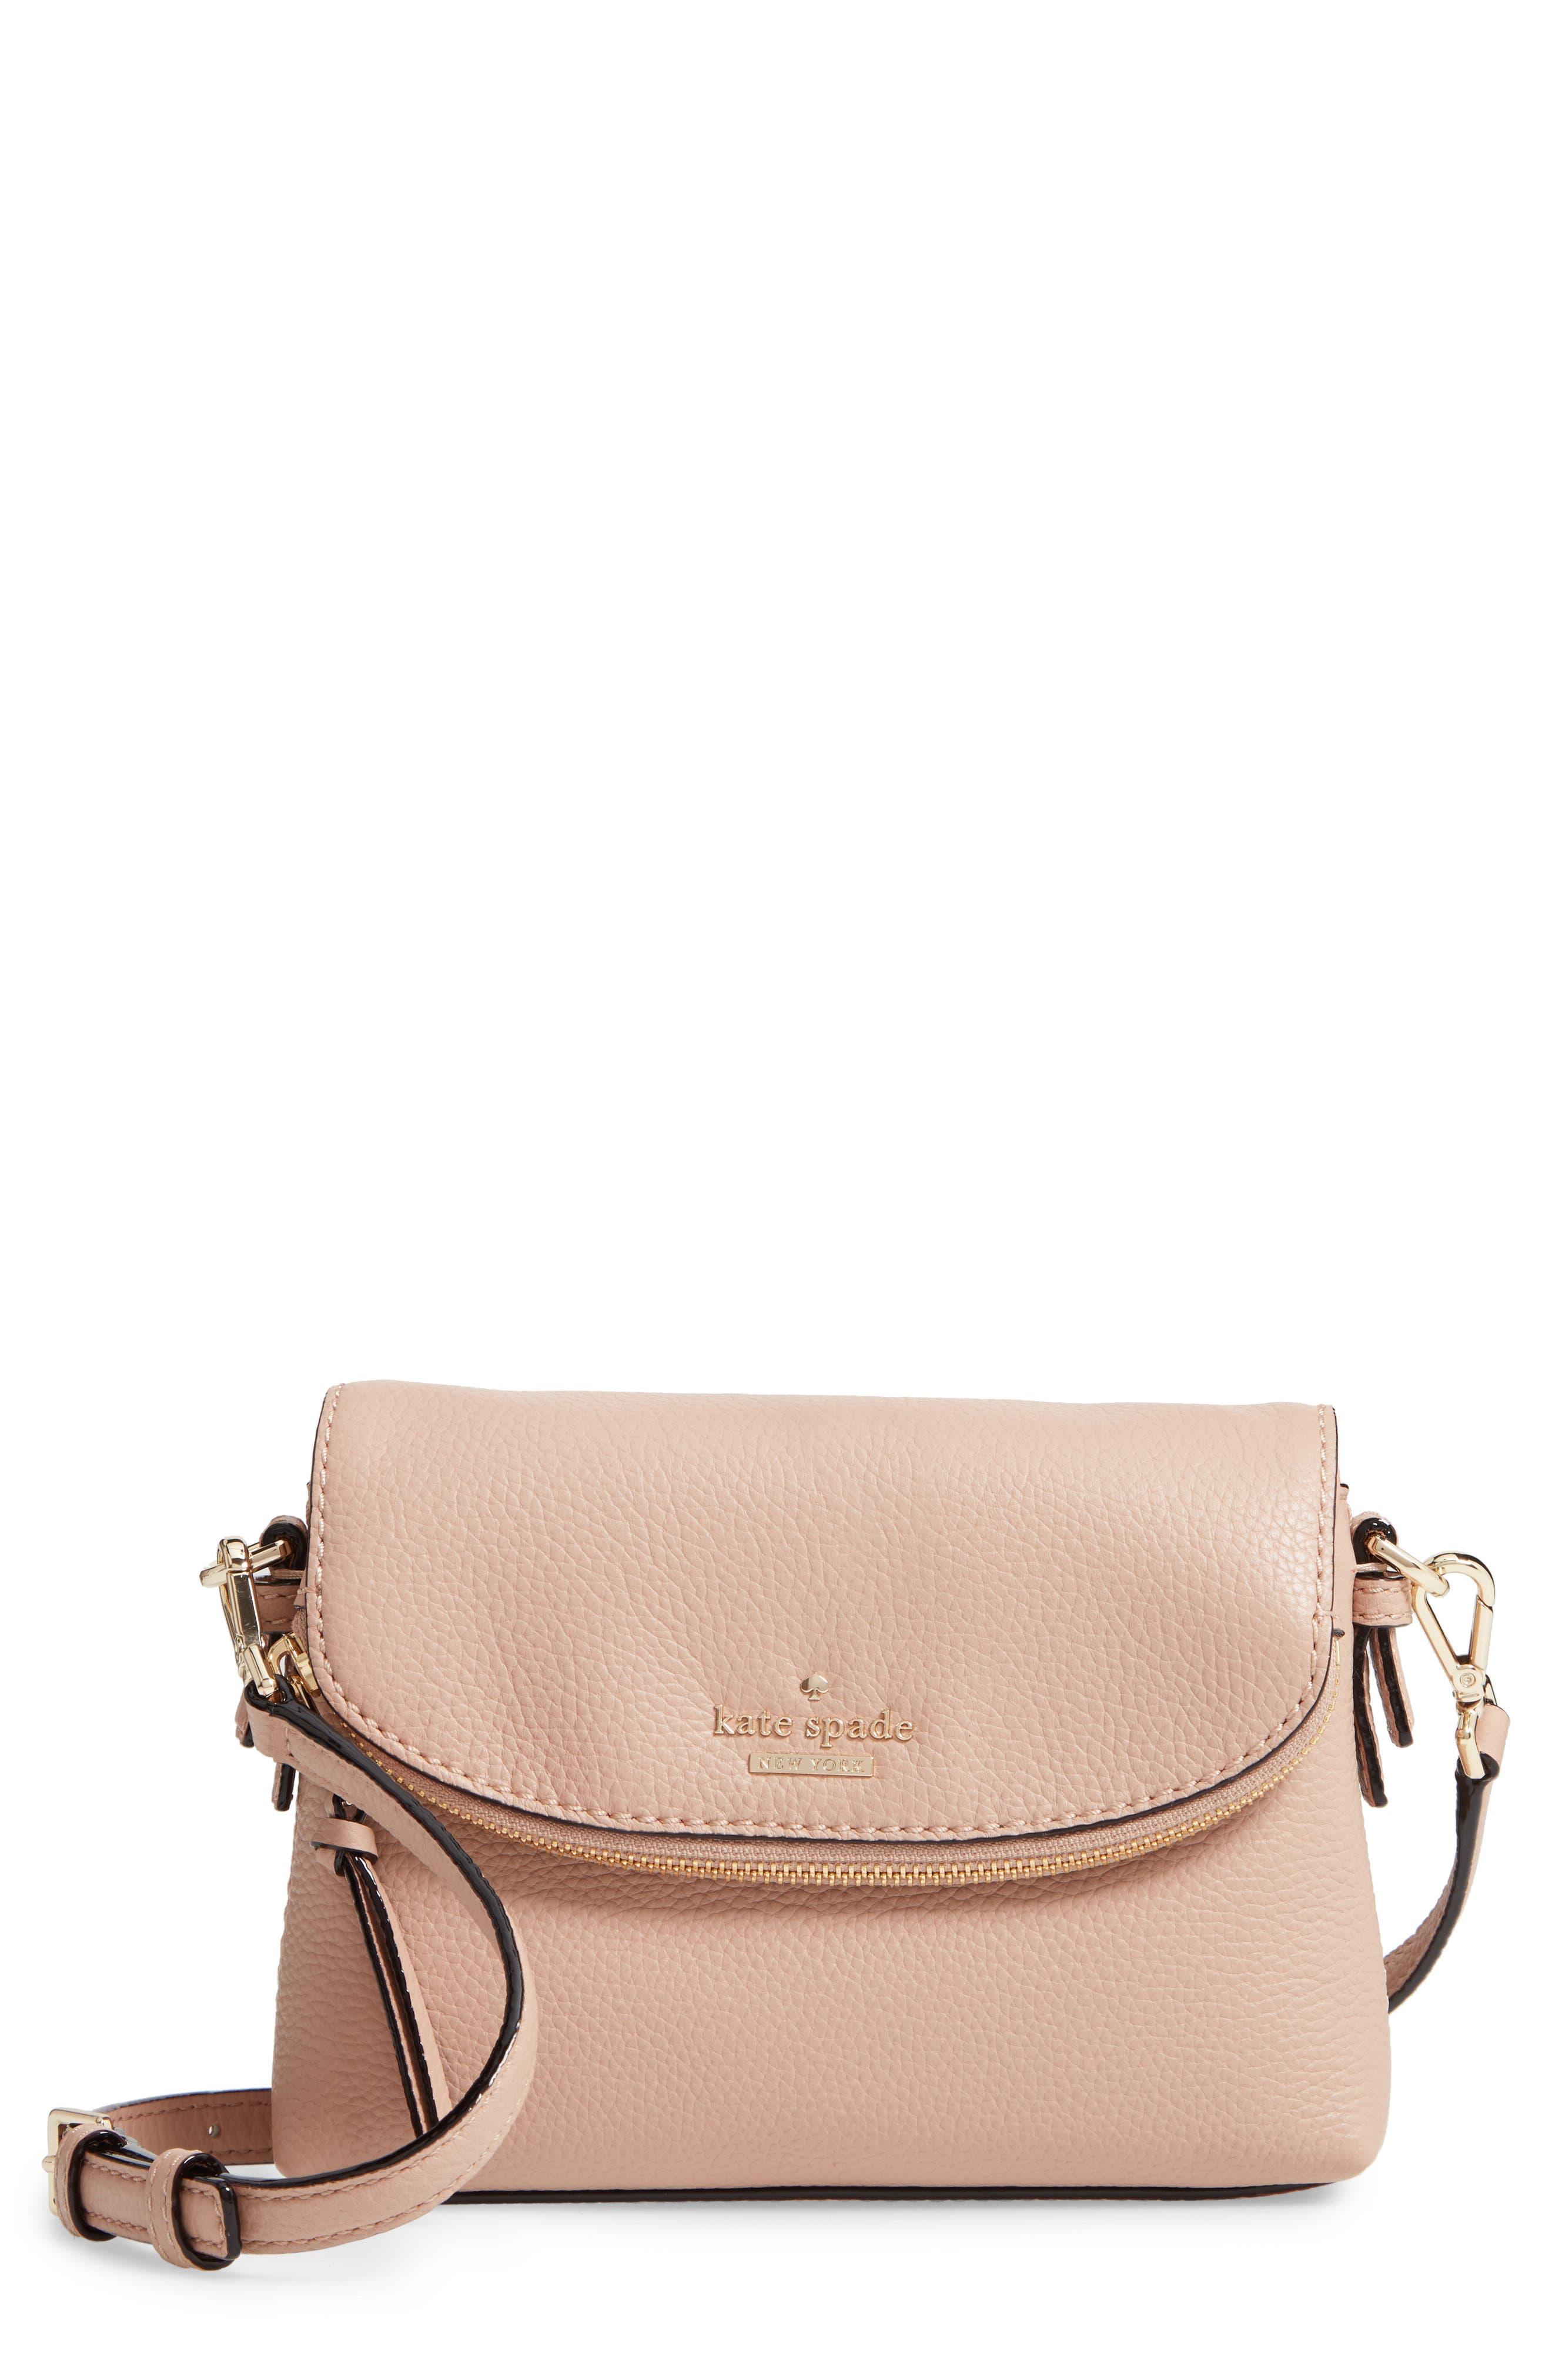 KATE SPADE NEW YORK,                             jackson street small harlyn leather crossbody bag,                             Main thumbnail 1, color,                             253